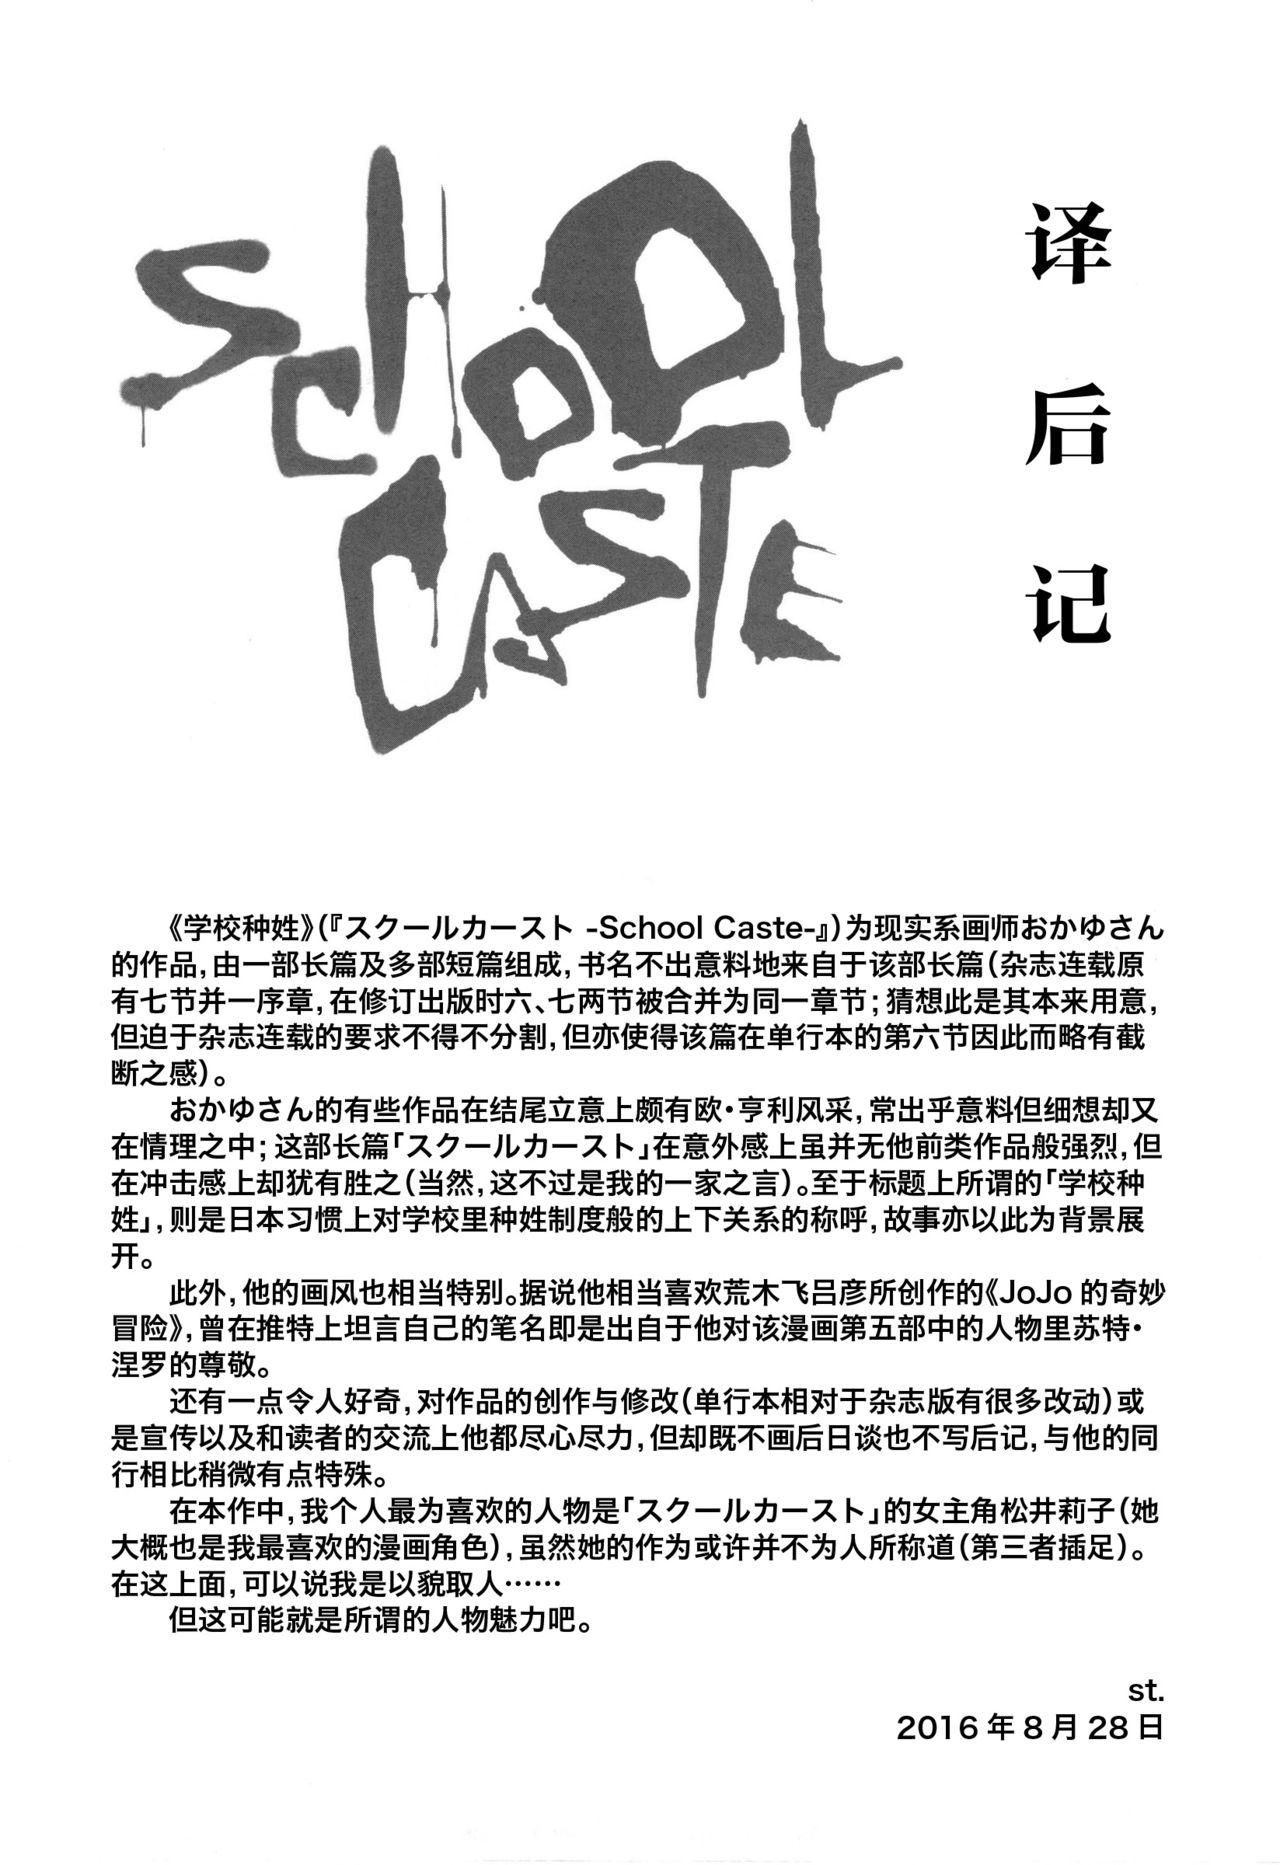 School Caste 212